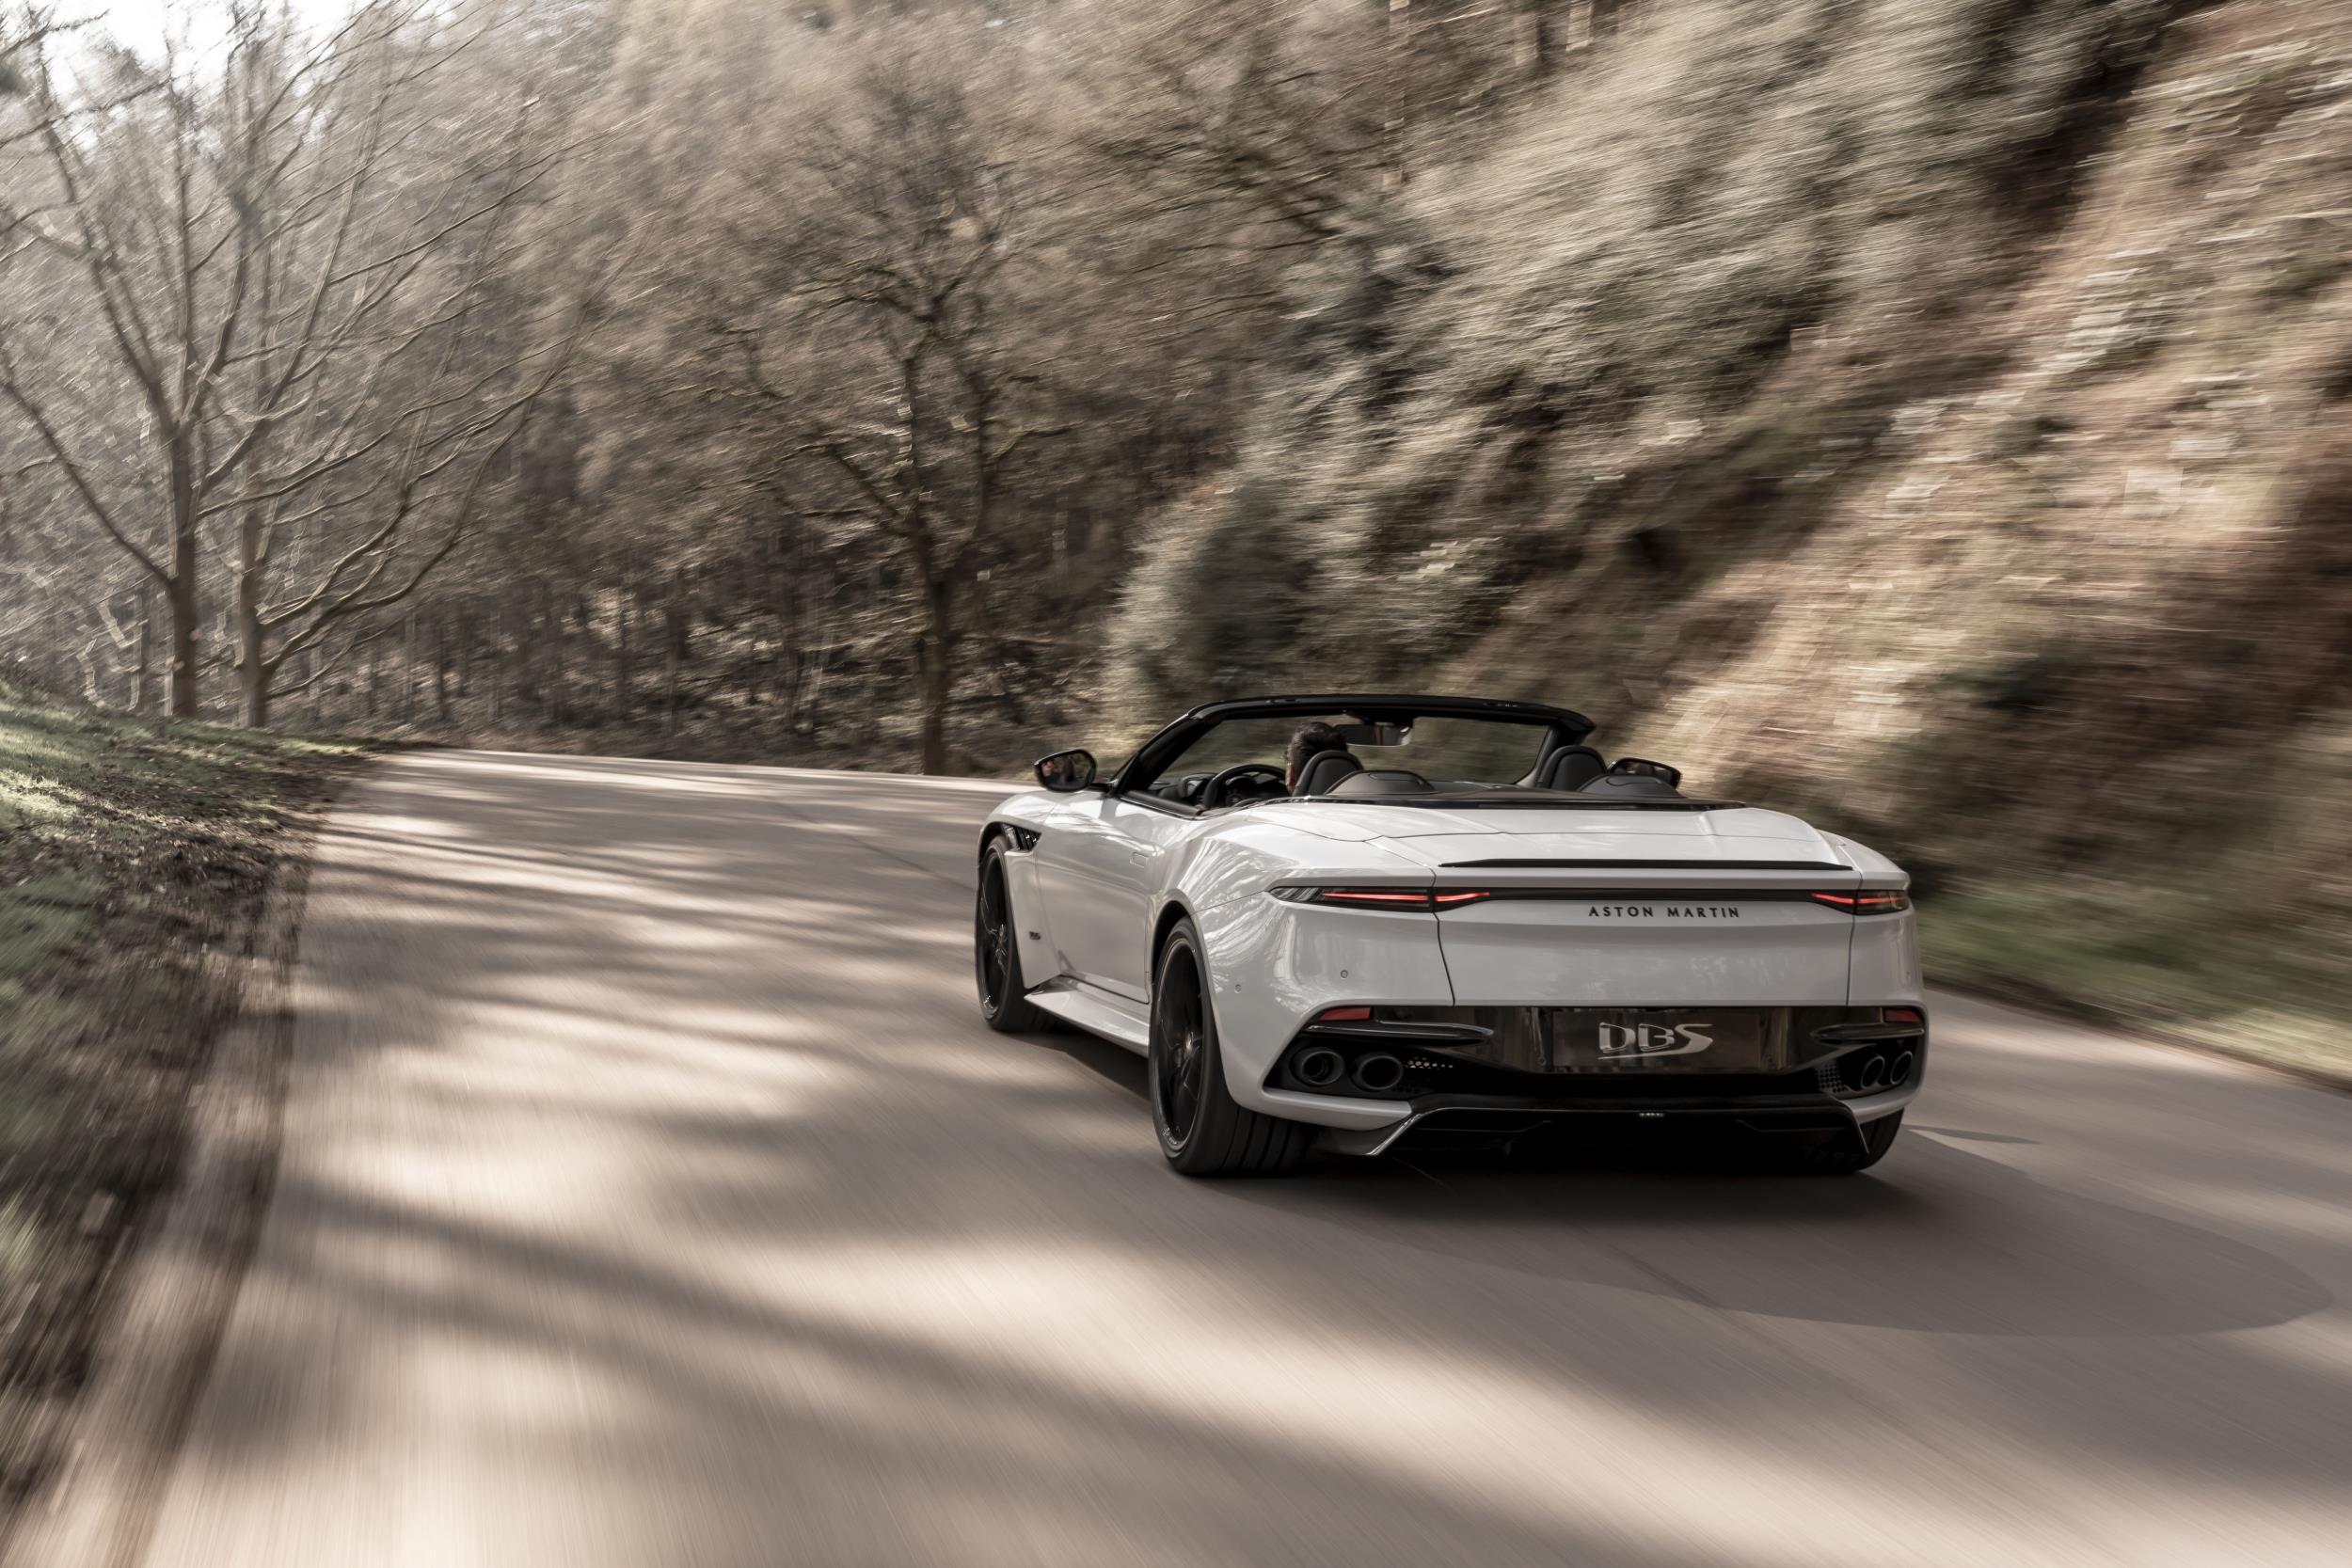 Aston Martin DBS Superleggera Volante Is The Brand's ...  |Aston Martin Dbs Volante